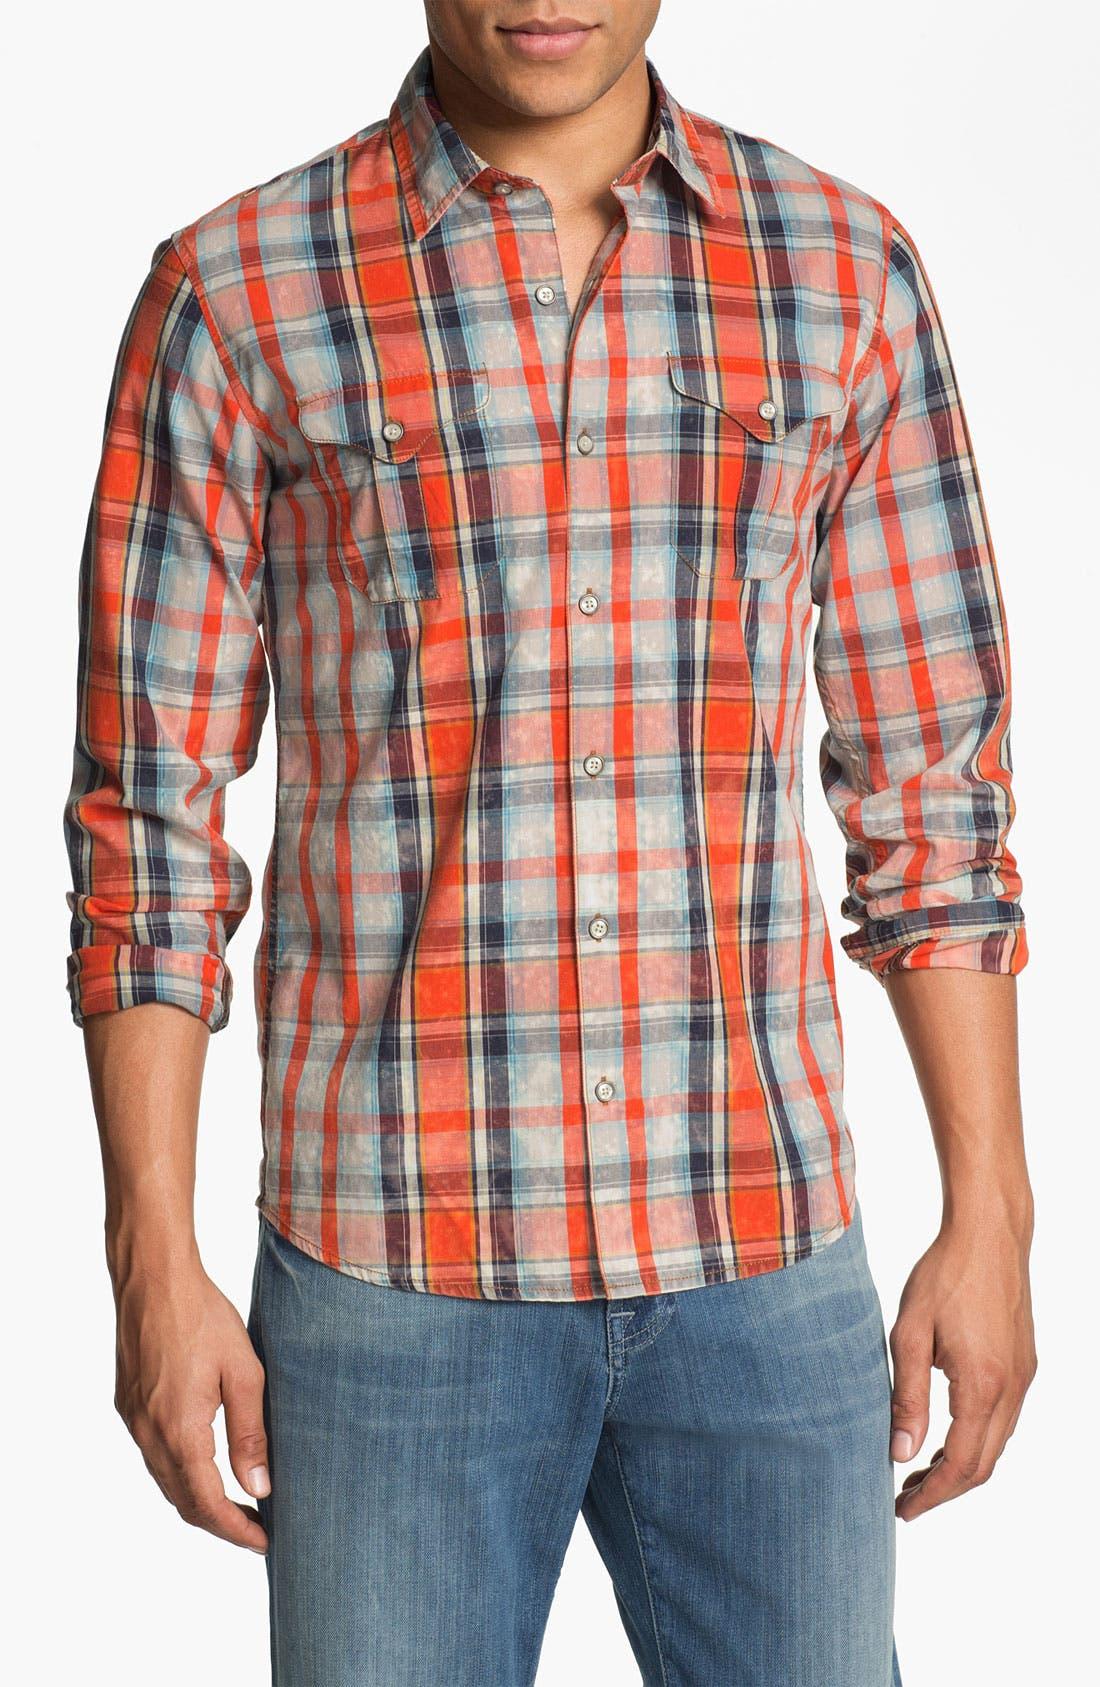 Alternate Image 1 Selected - 55DSL 'Sweel' Check Print Woven Shirt